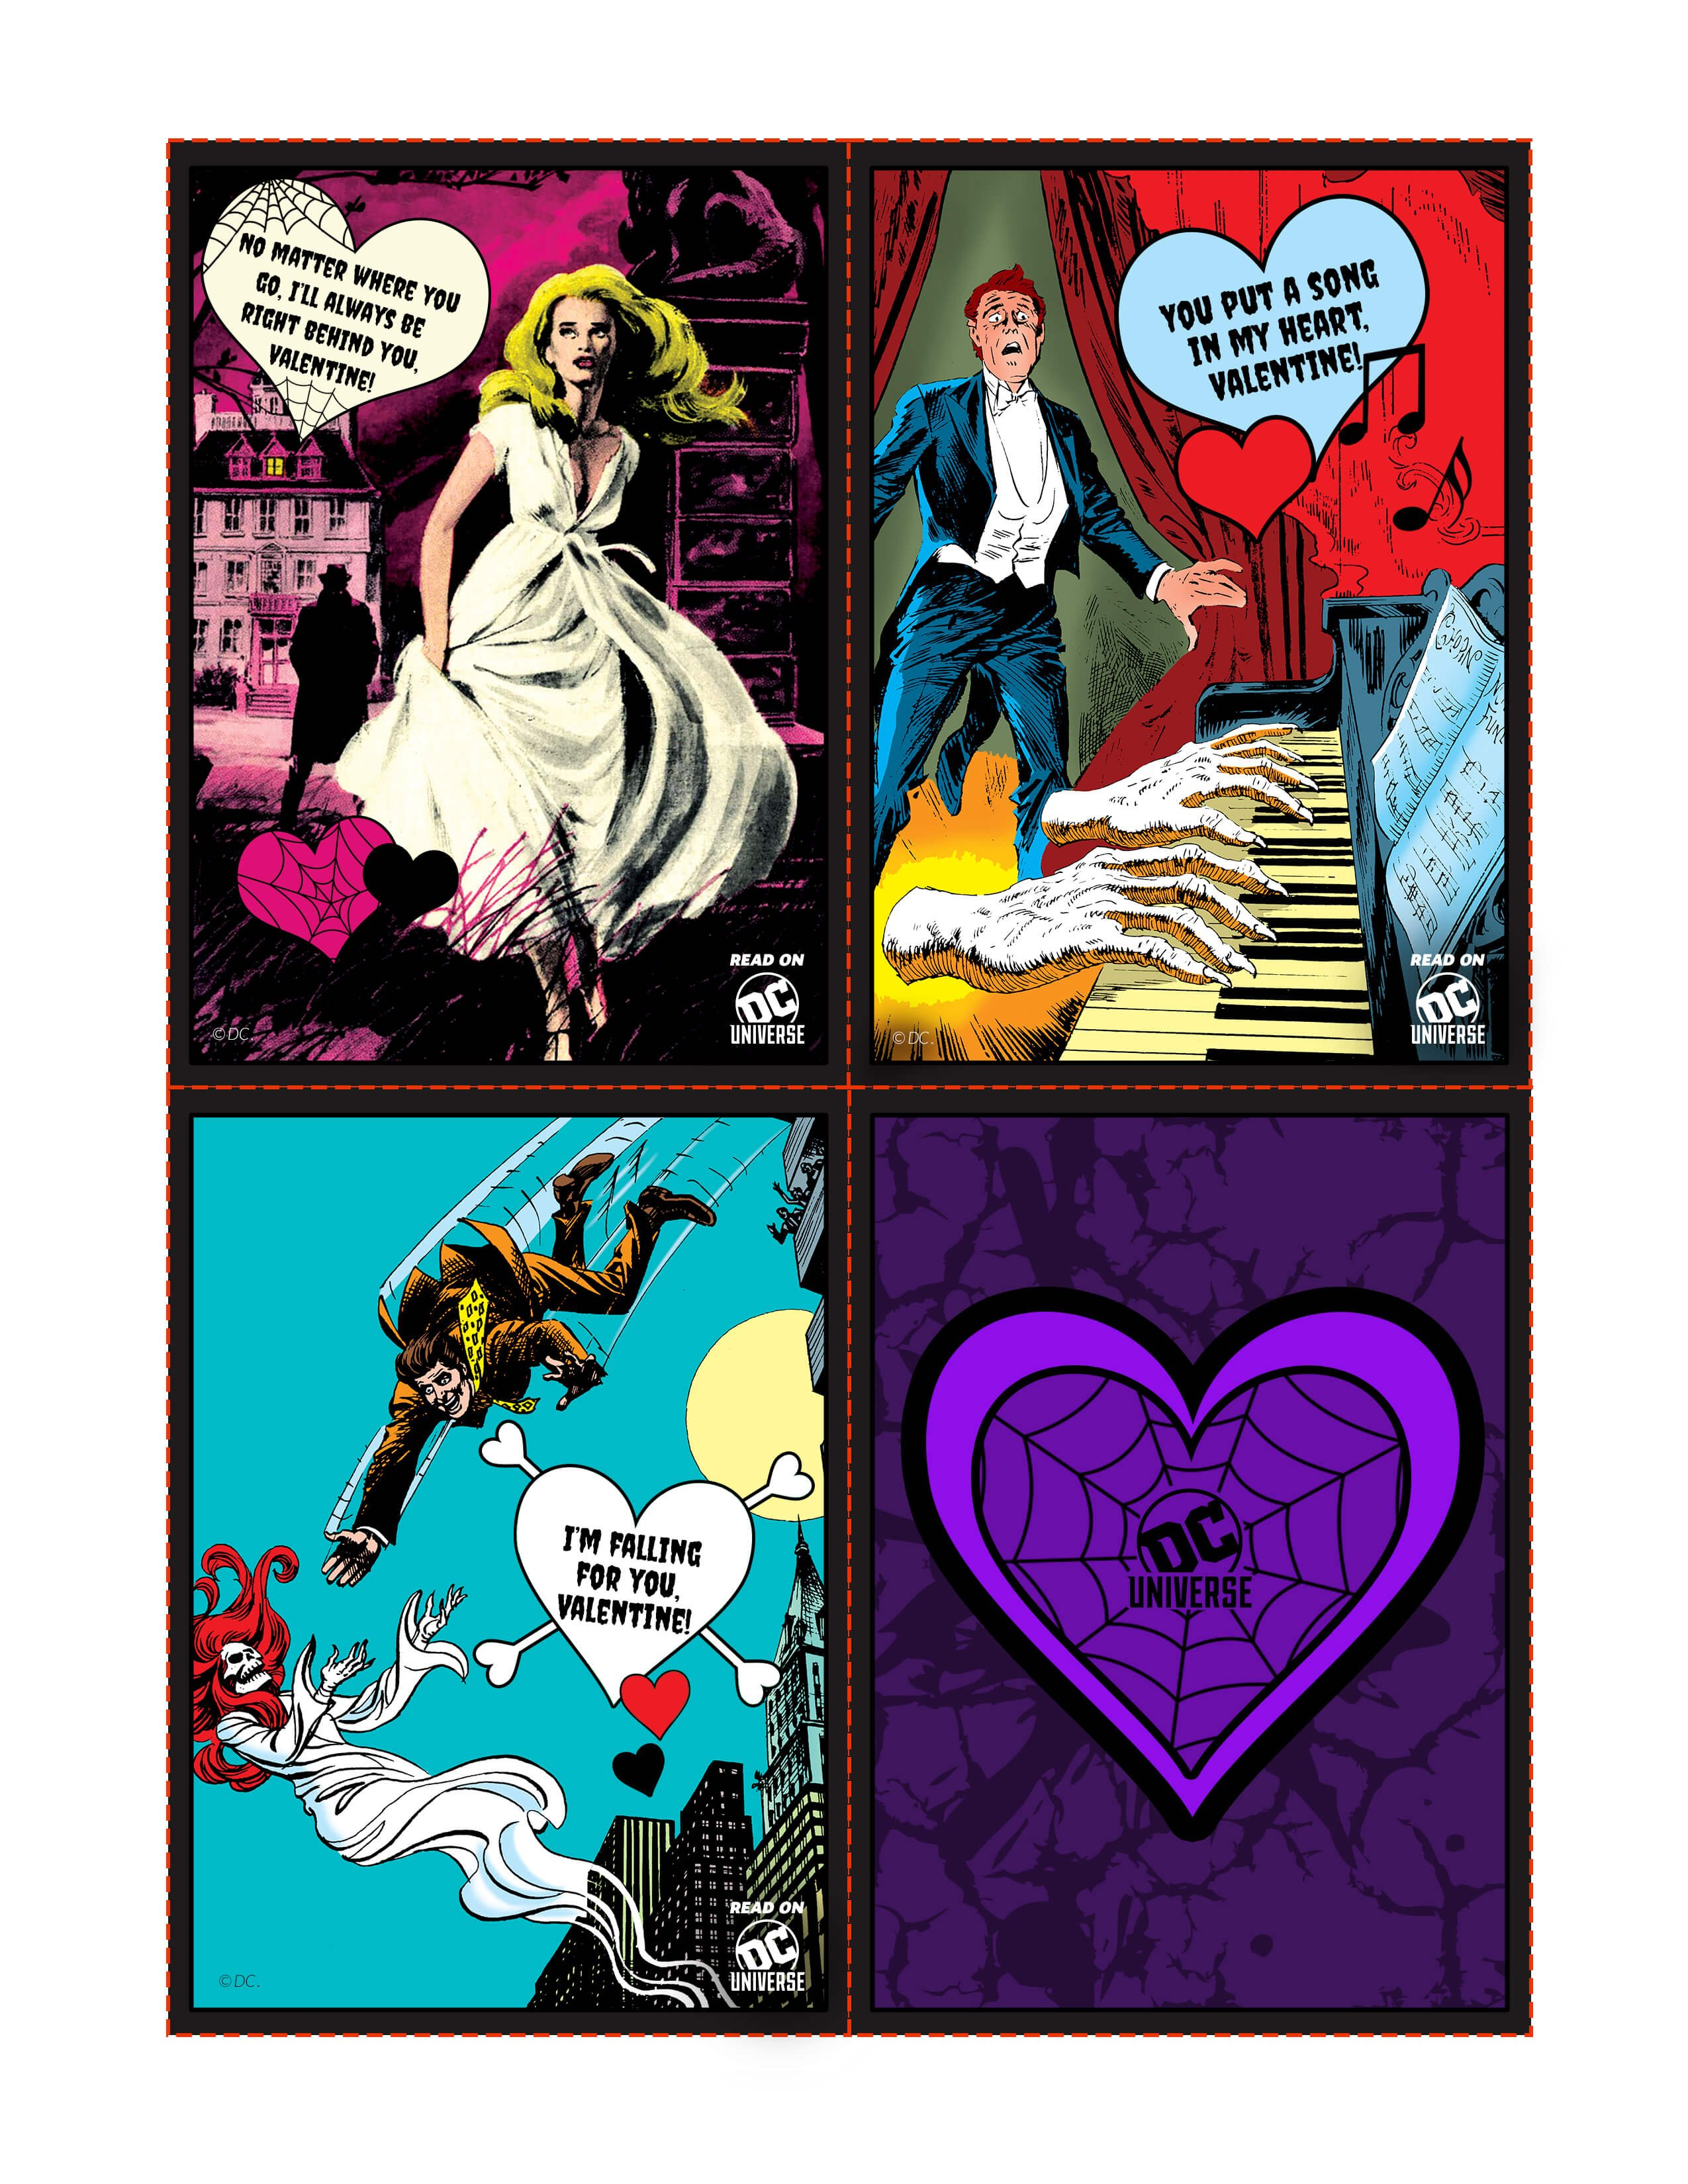 Spooky Valentines Day1-2.jpg